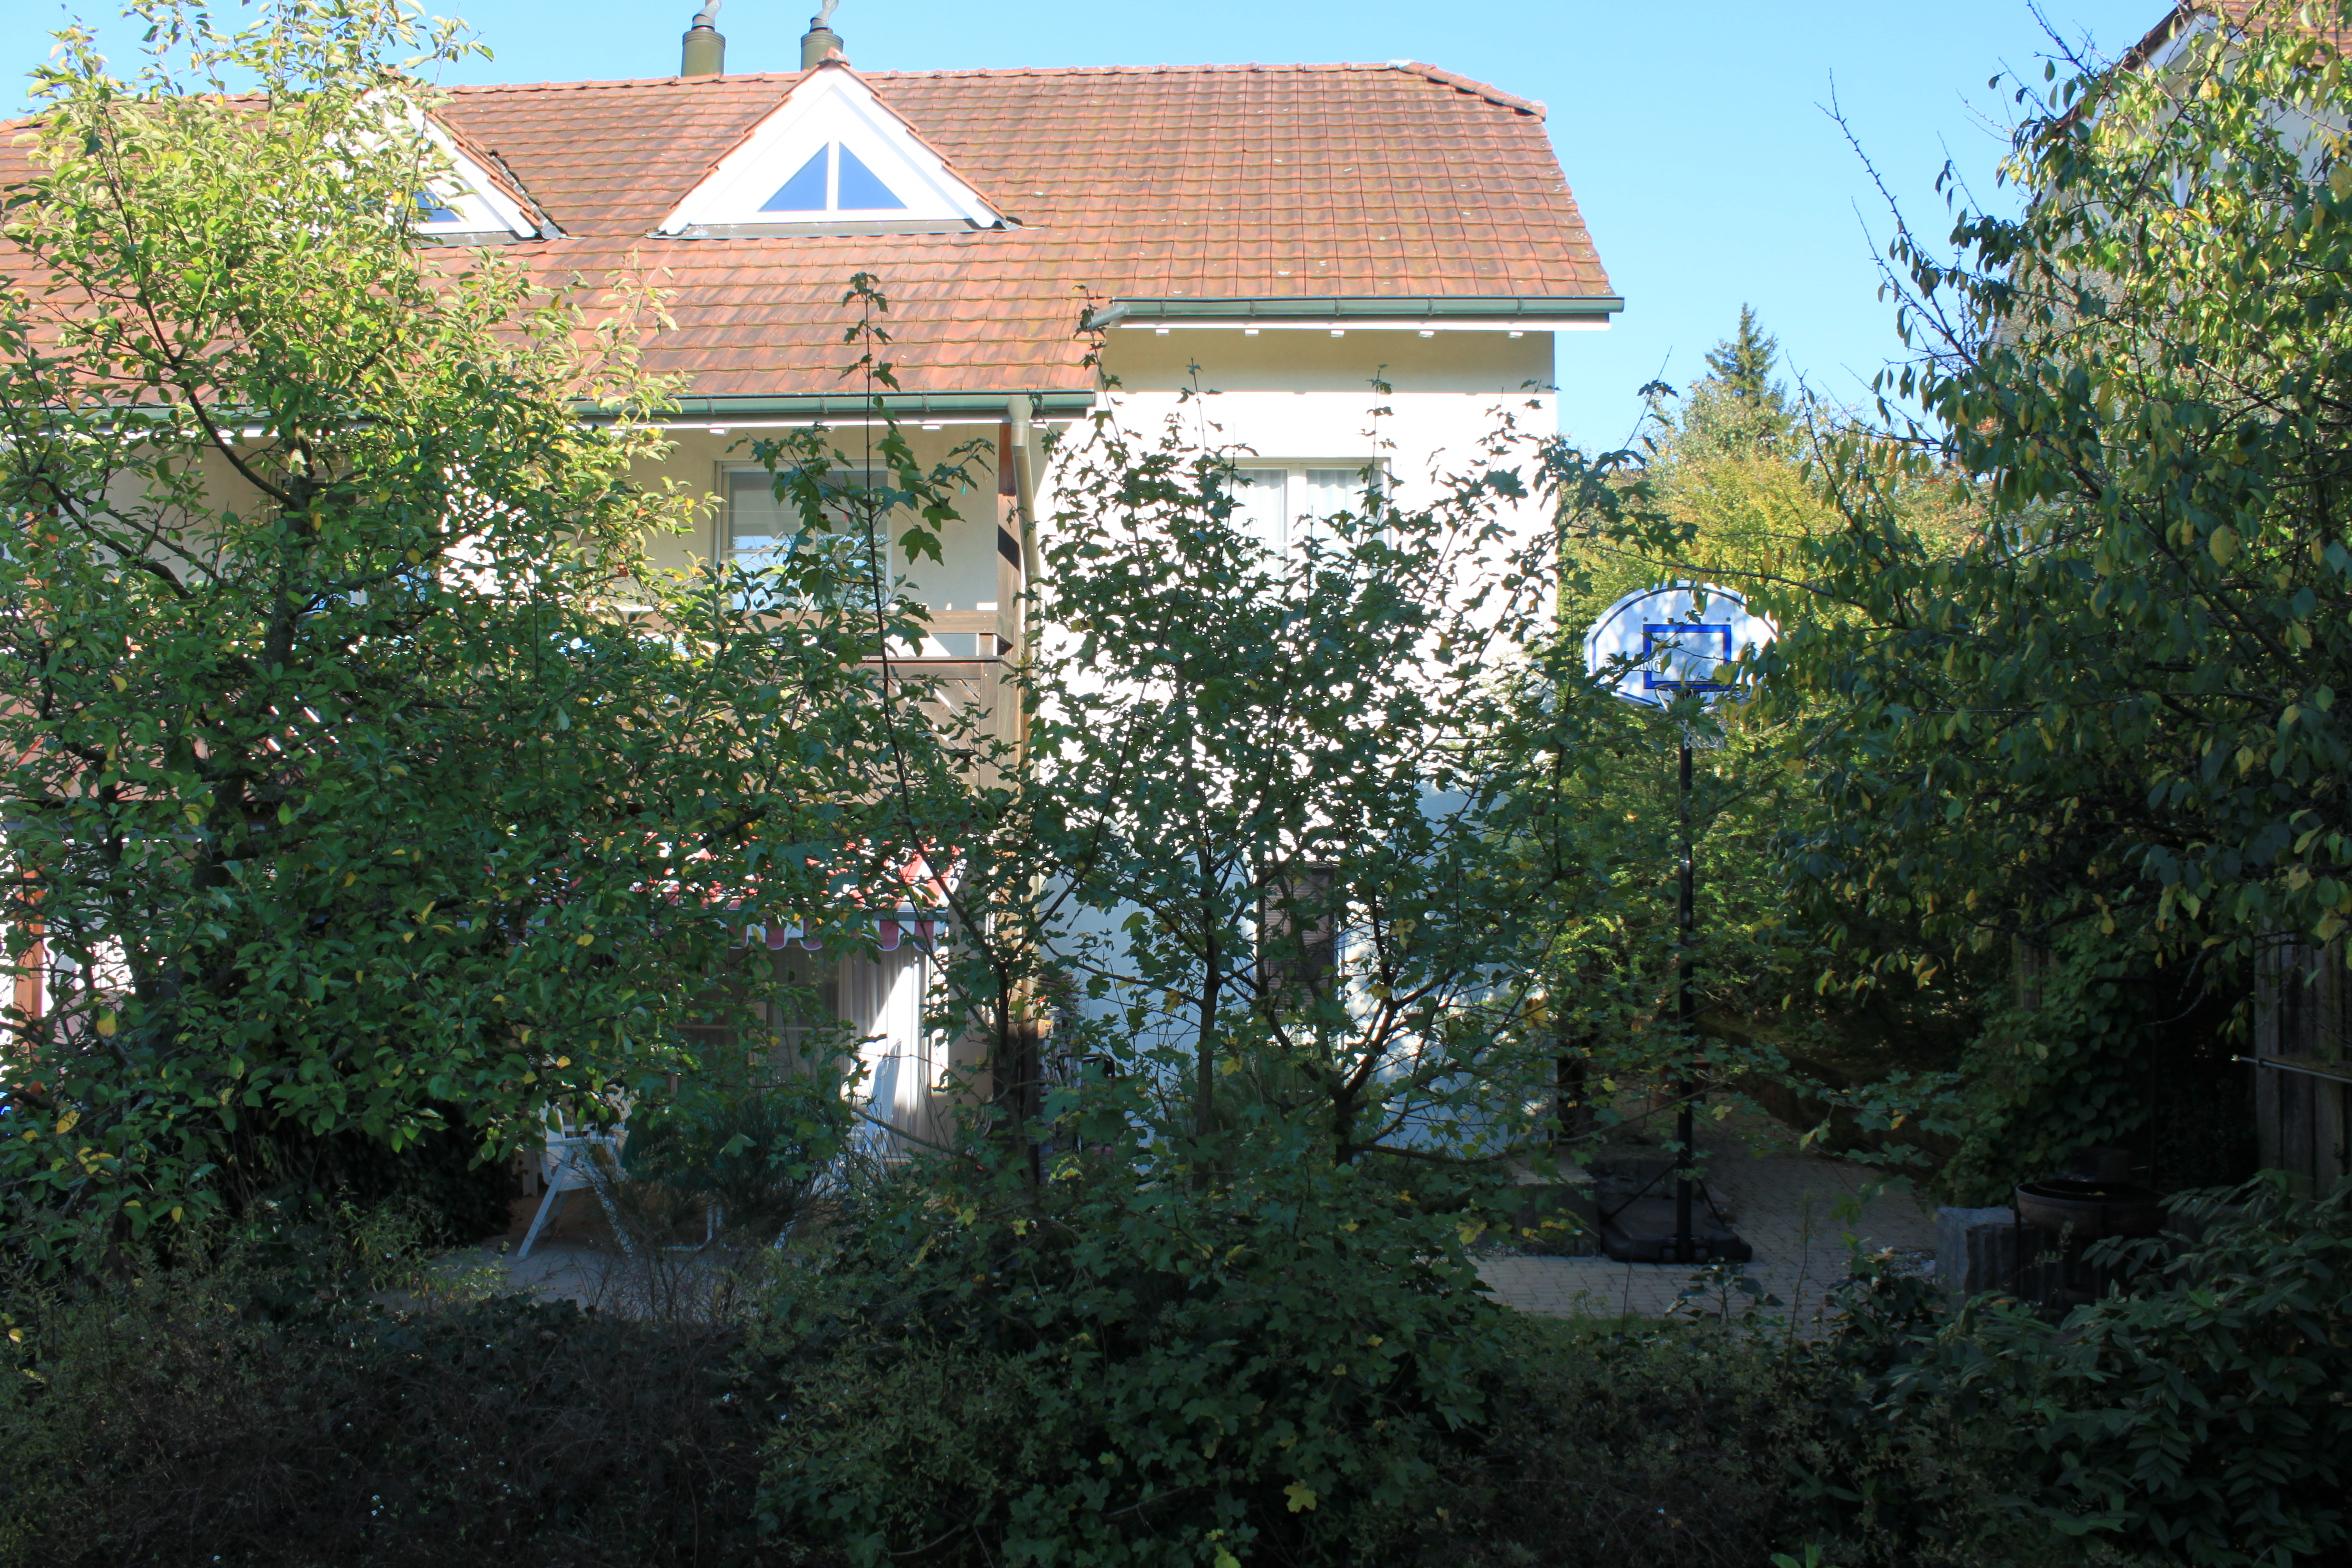 5,5-Zimmer-Doppel-EFH in Allschwil (verkauft)